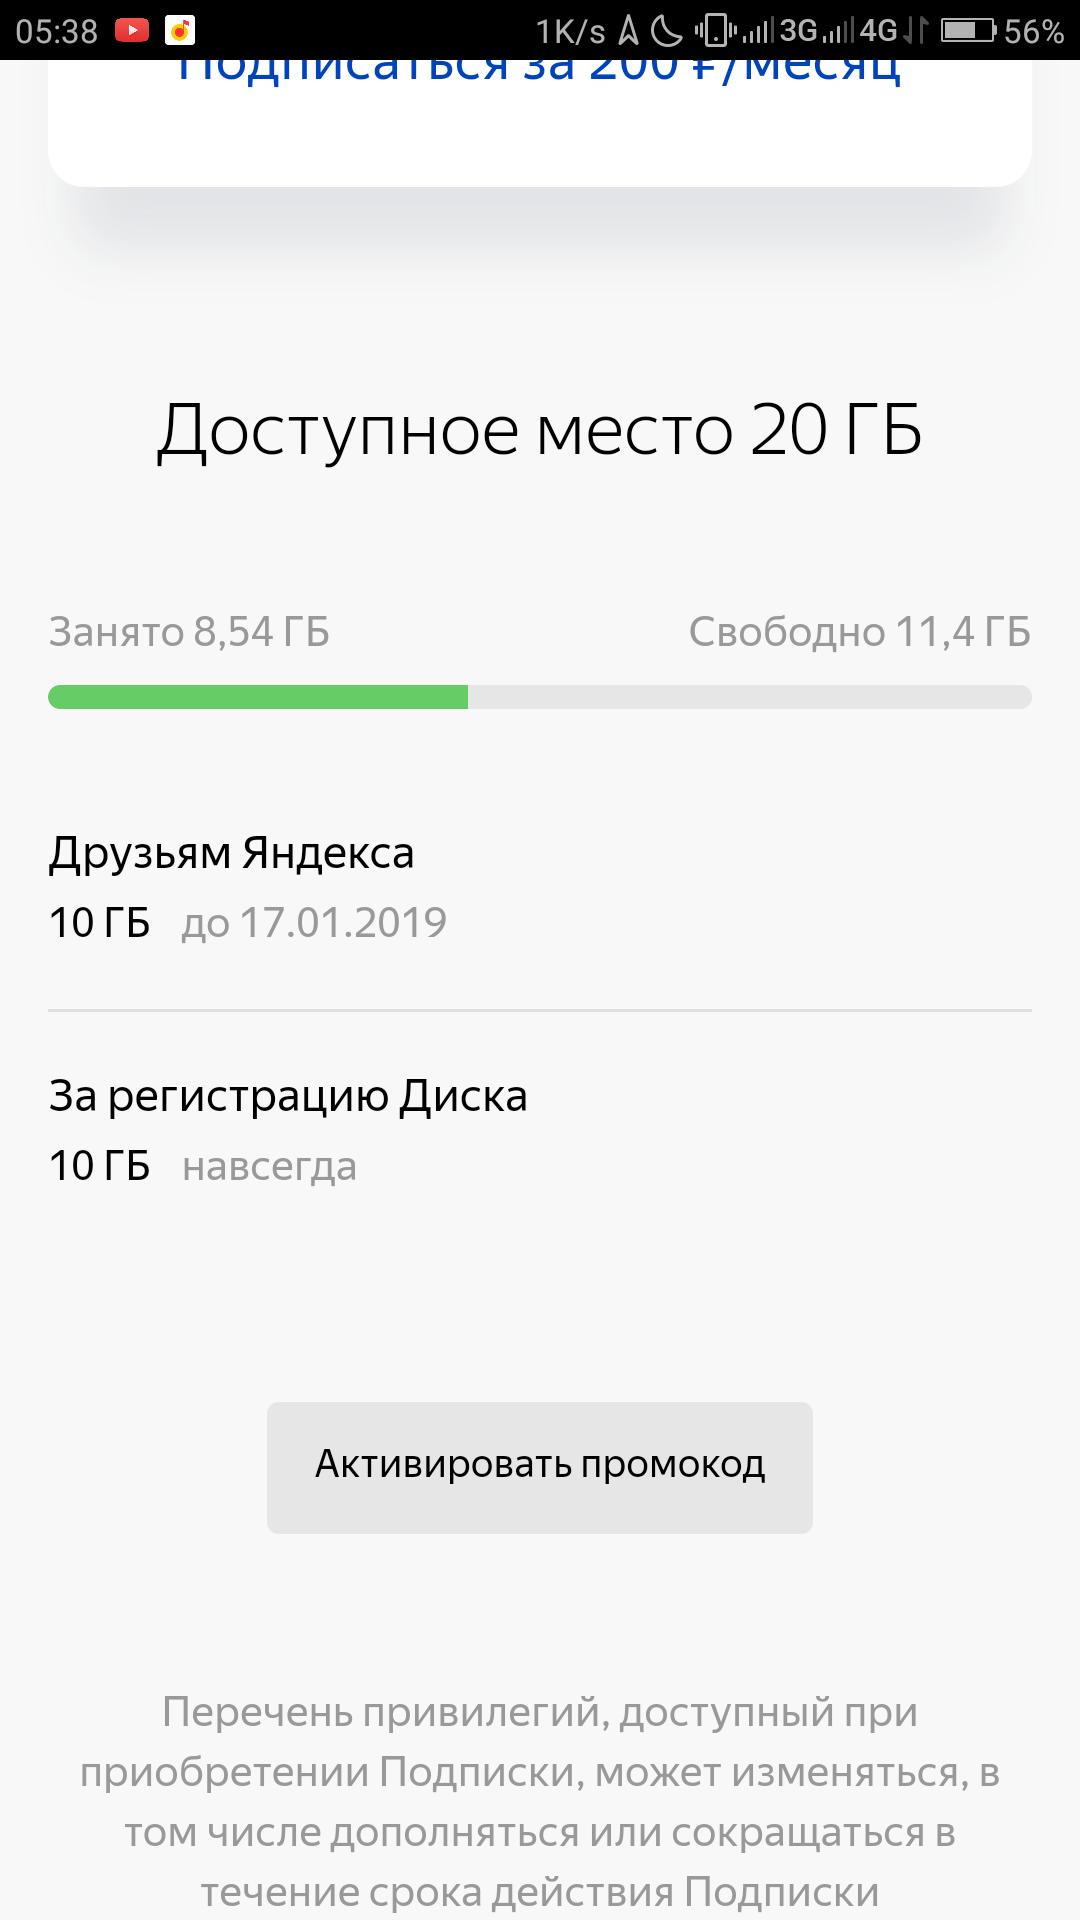 Yandex Disk Promo Code